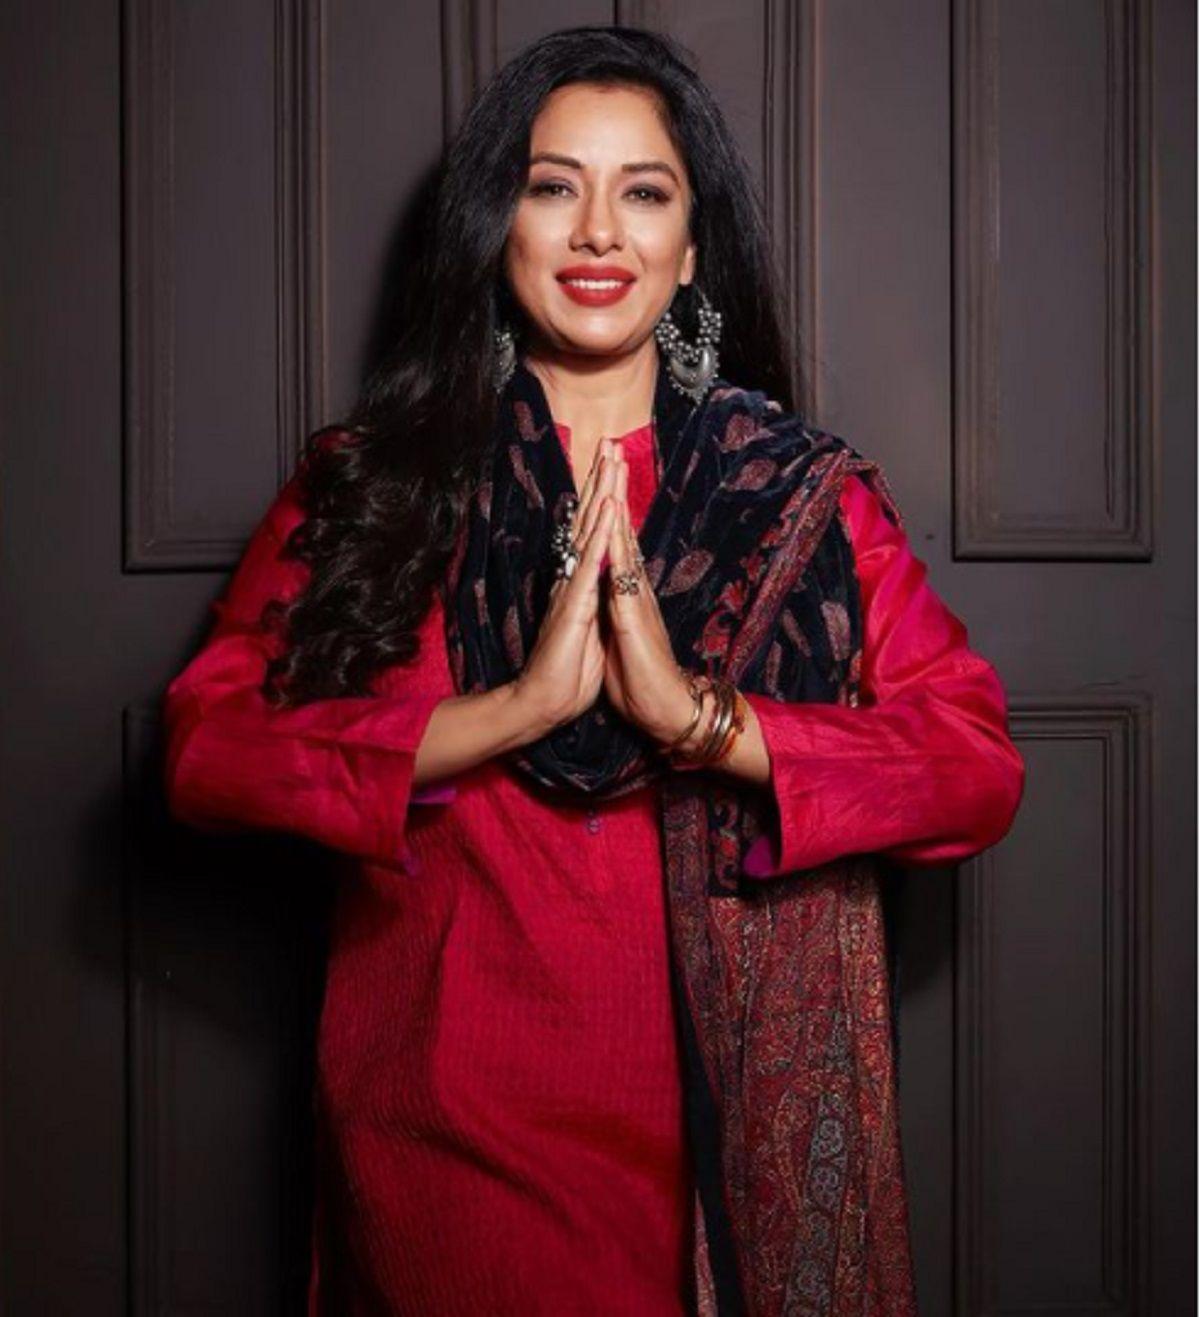 Anupama actress Rupali Ganguly